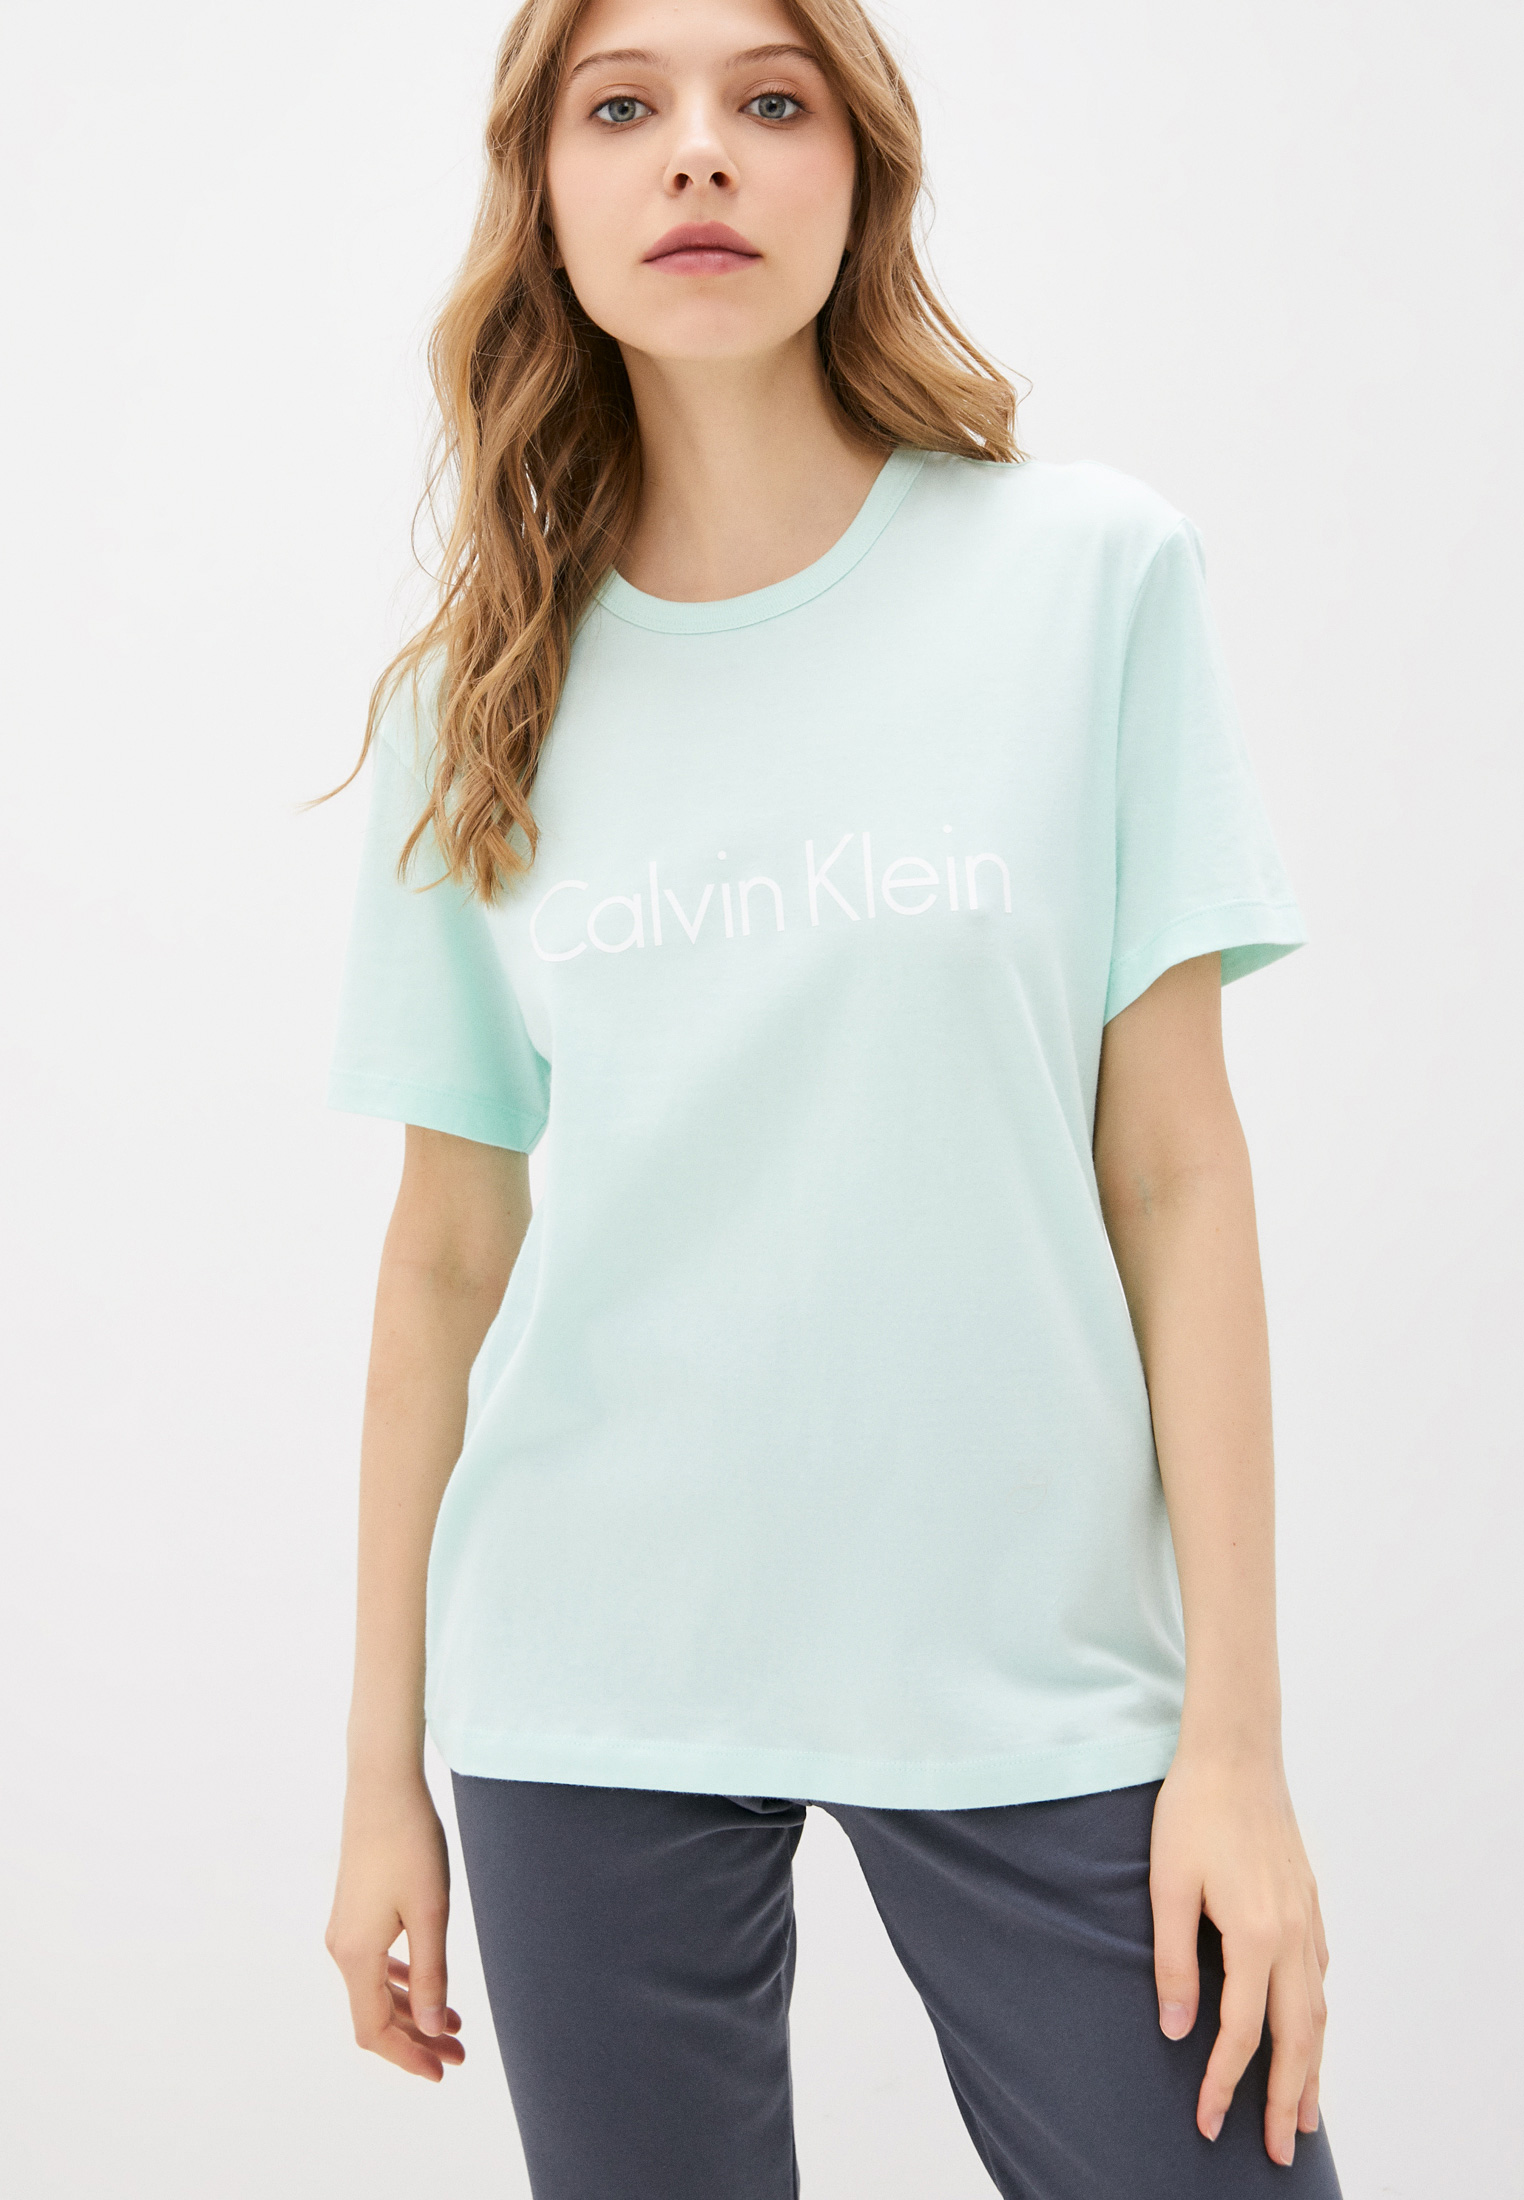 Домашняя футболка Calvin Klein Underwear Футболка домашняя Calvin Klein Underwear